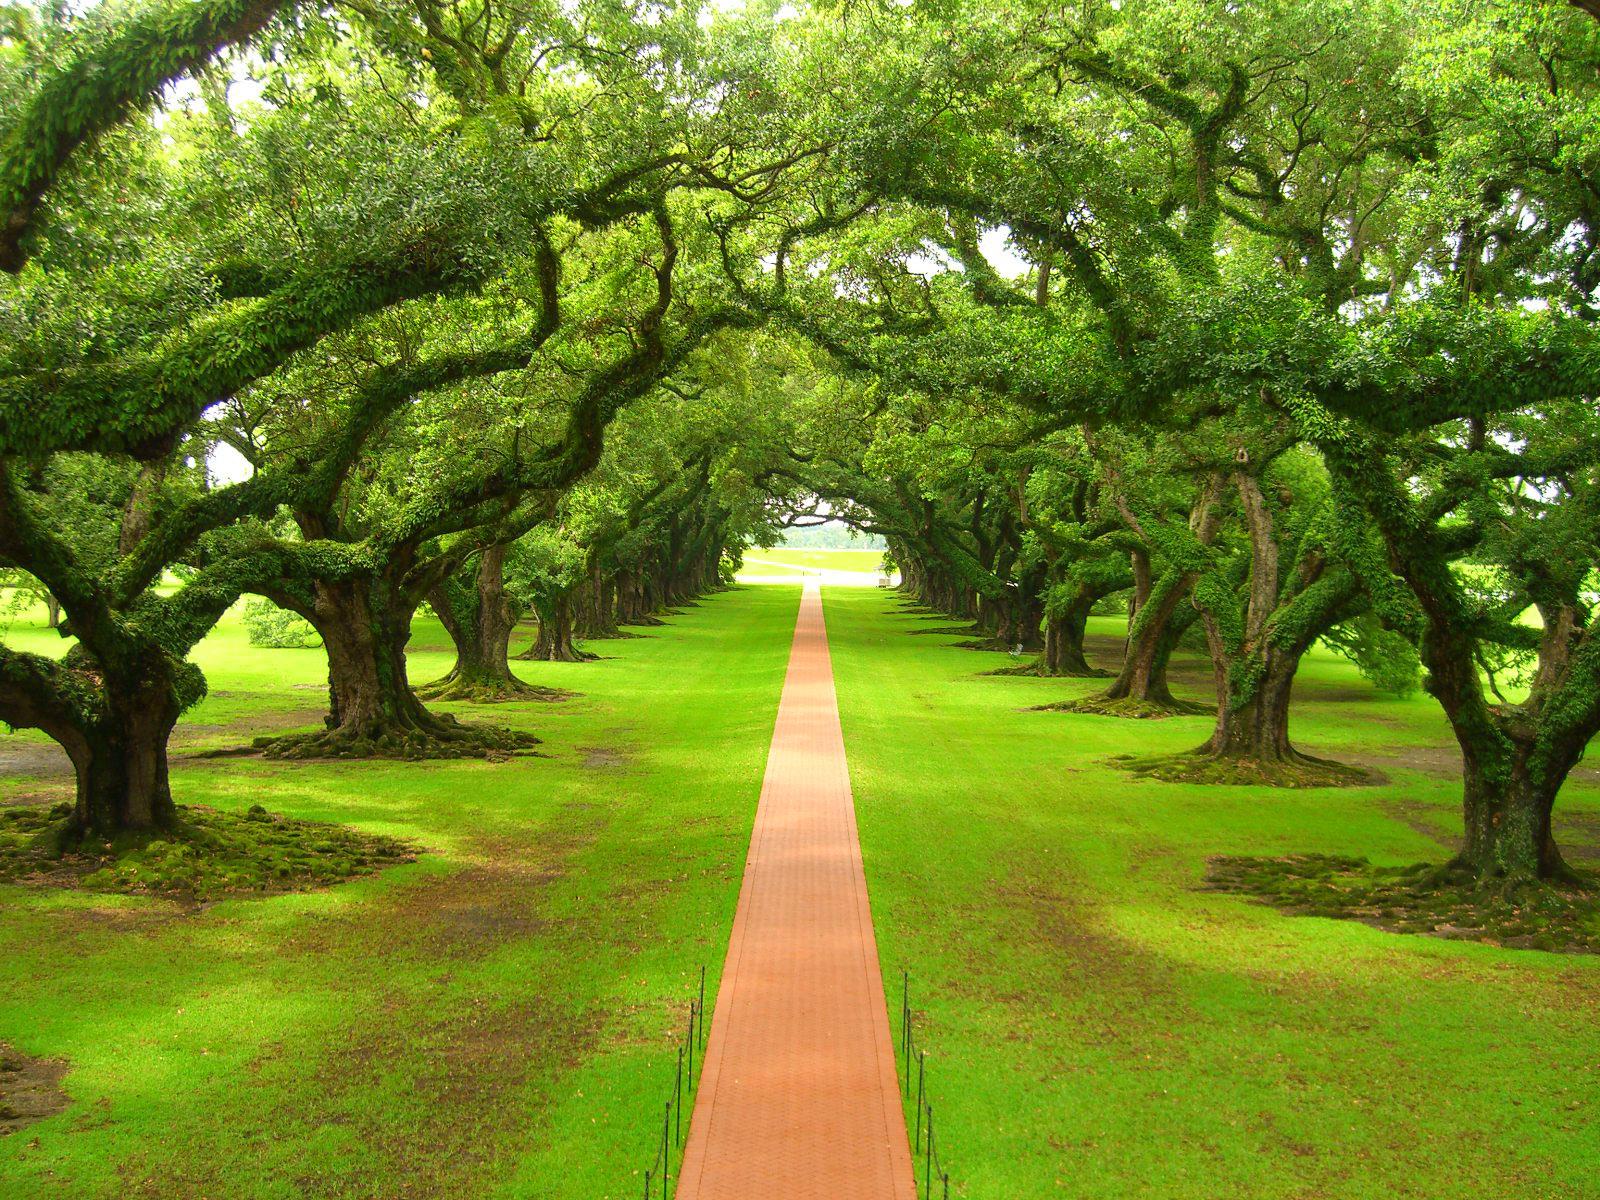 imagenesdepaisajespaisajes1jpg Paz de Selva Verde